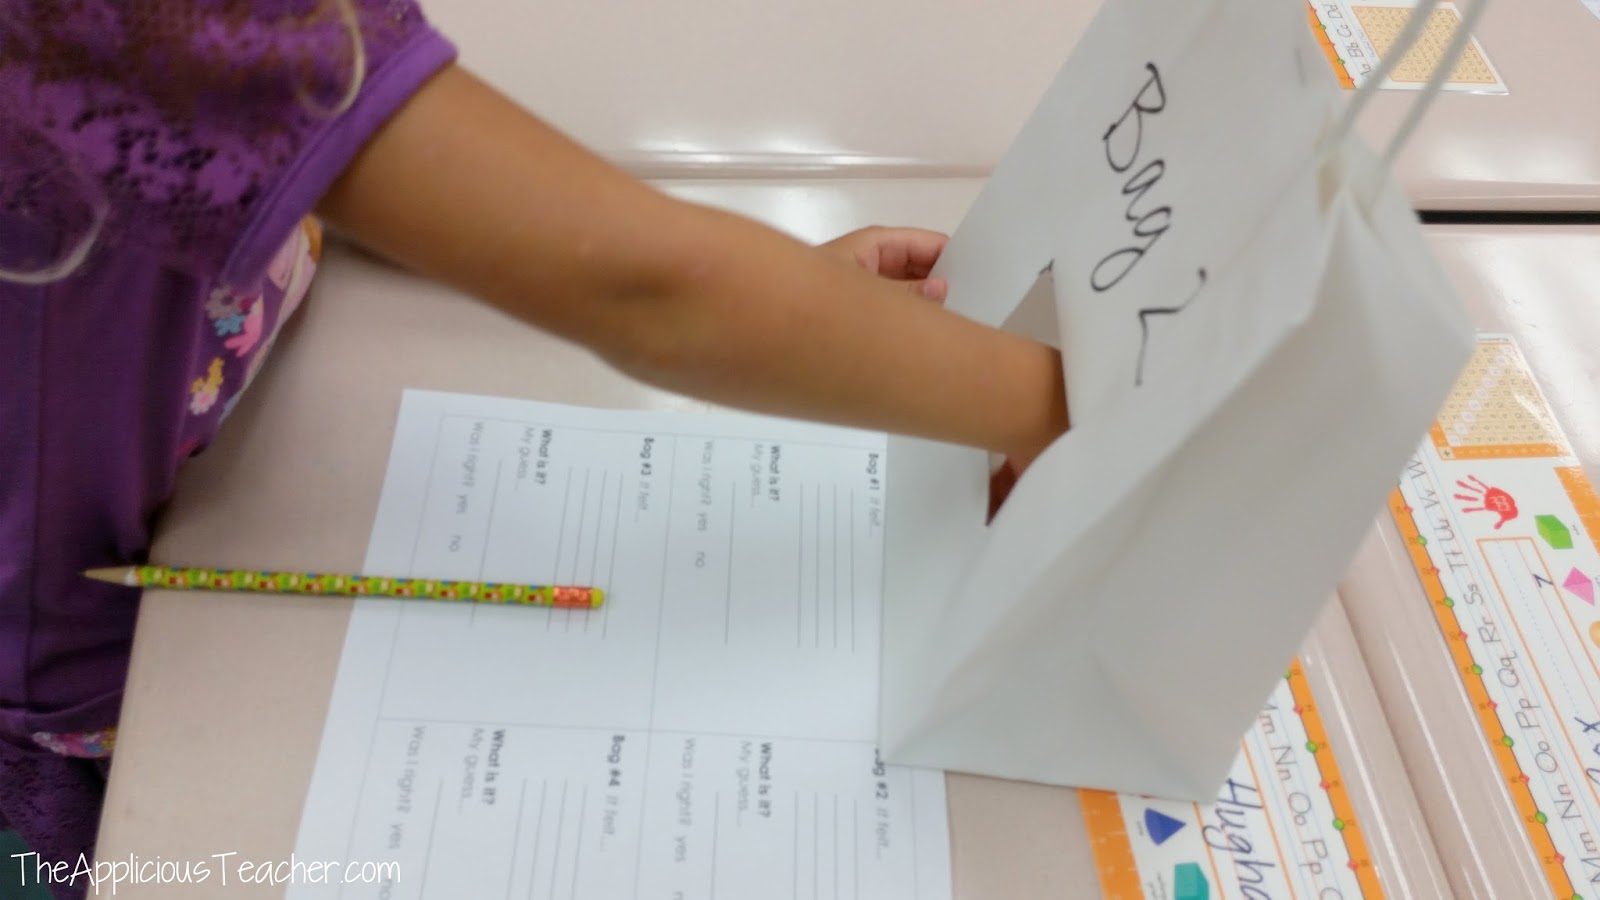 Exploring Science Inquiry Skills - The Applicious Teacher